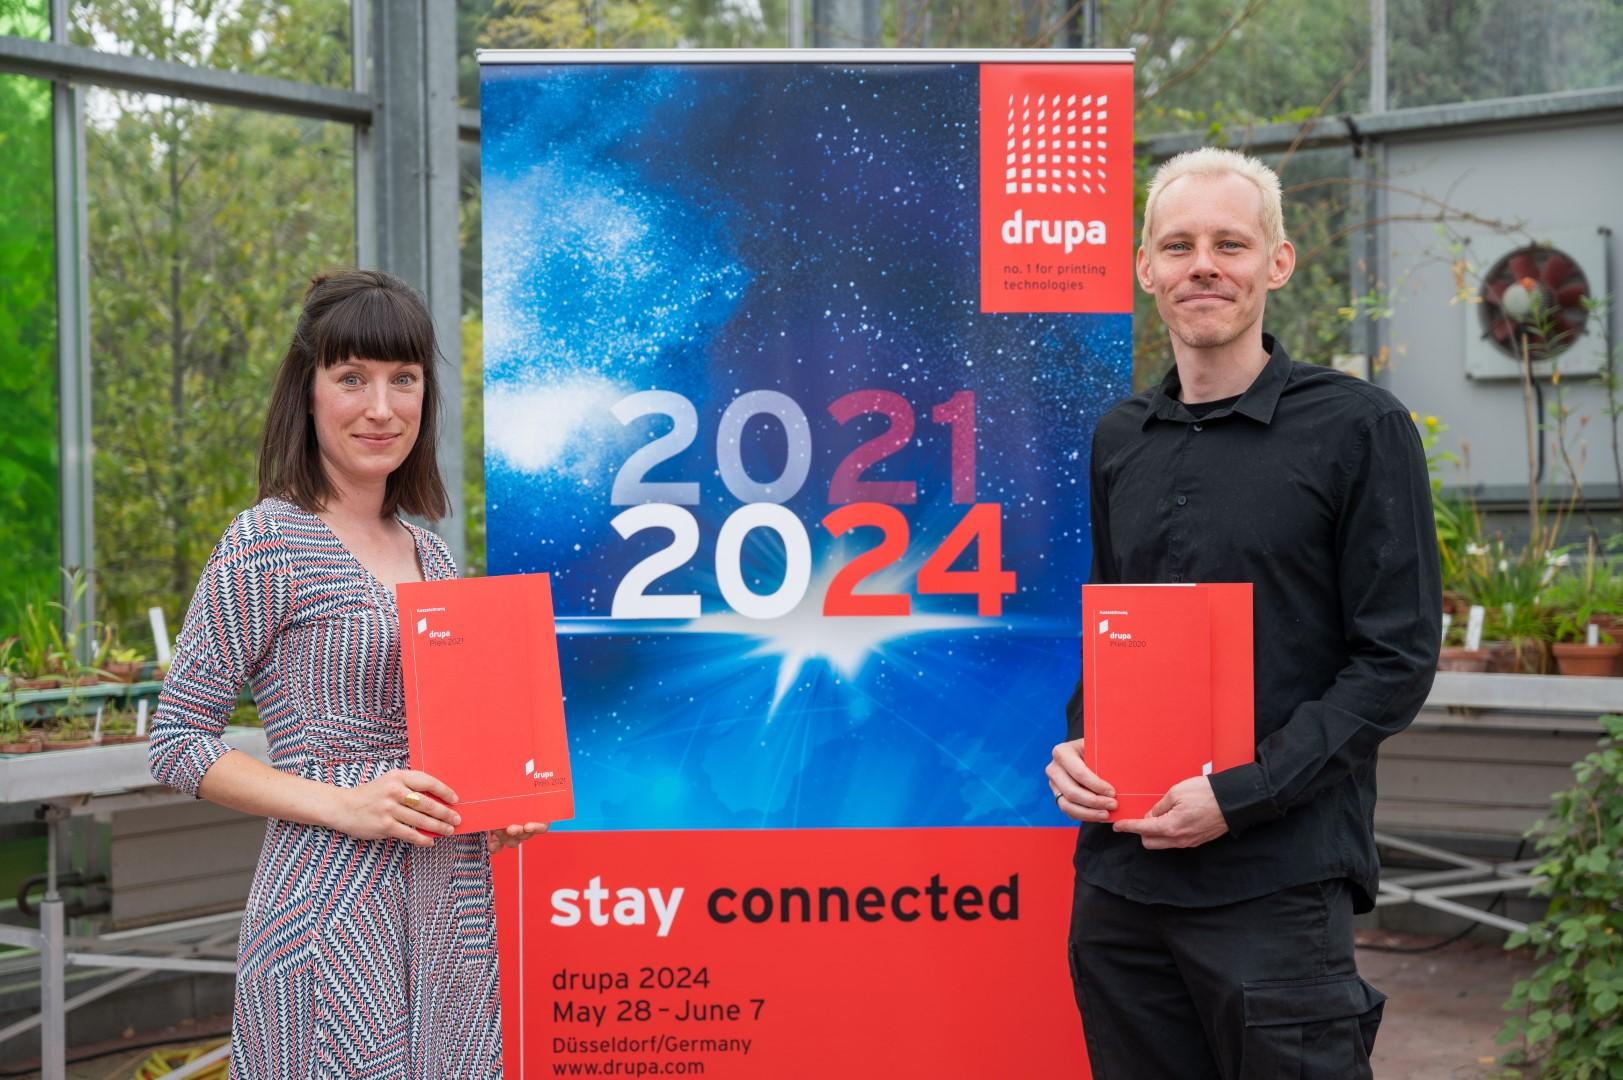 Dr. René Baston and Nina Goldt Scoop drupa Prizes 2020 and 2021